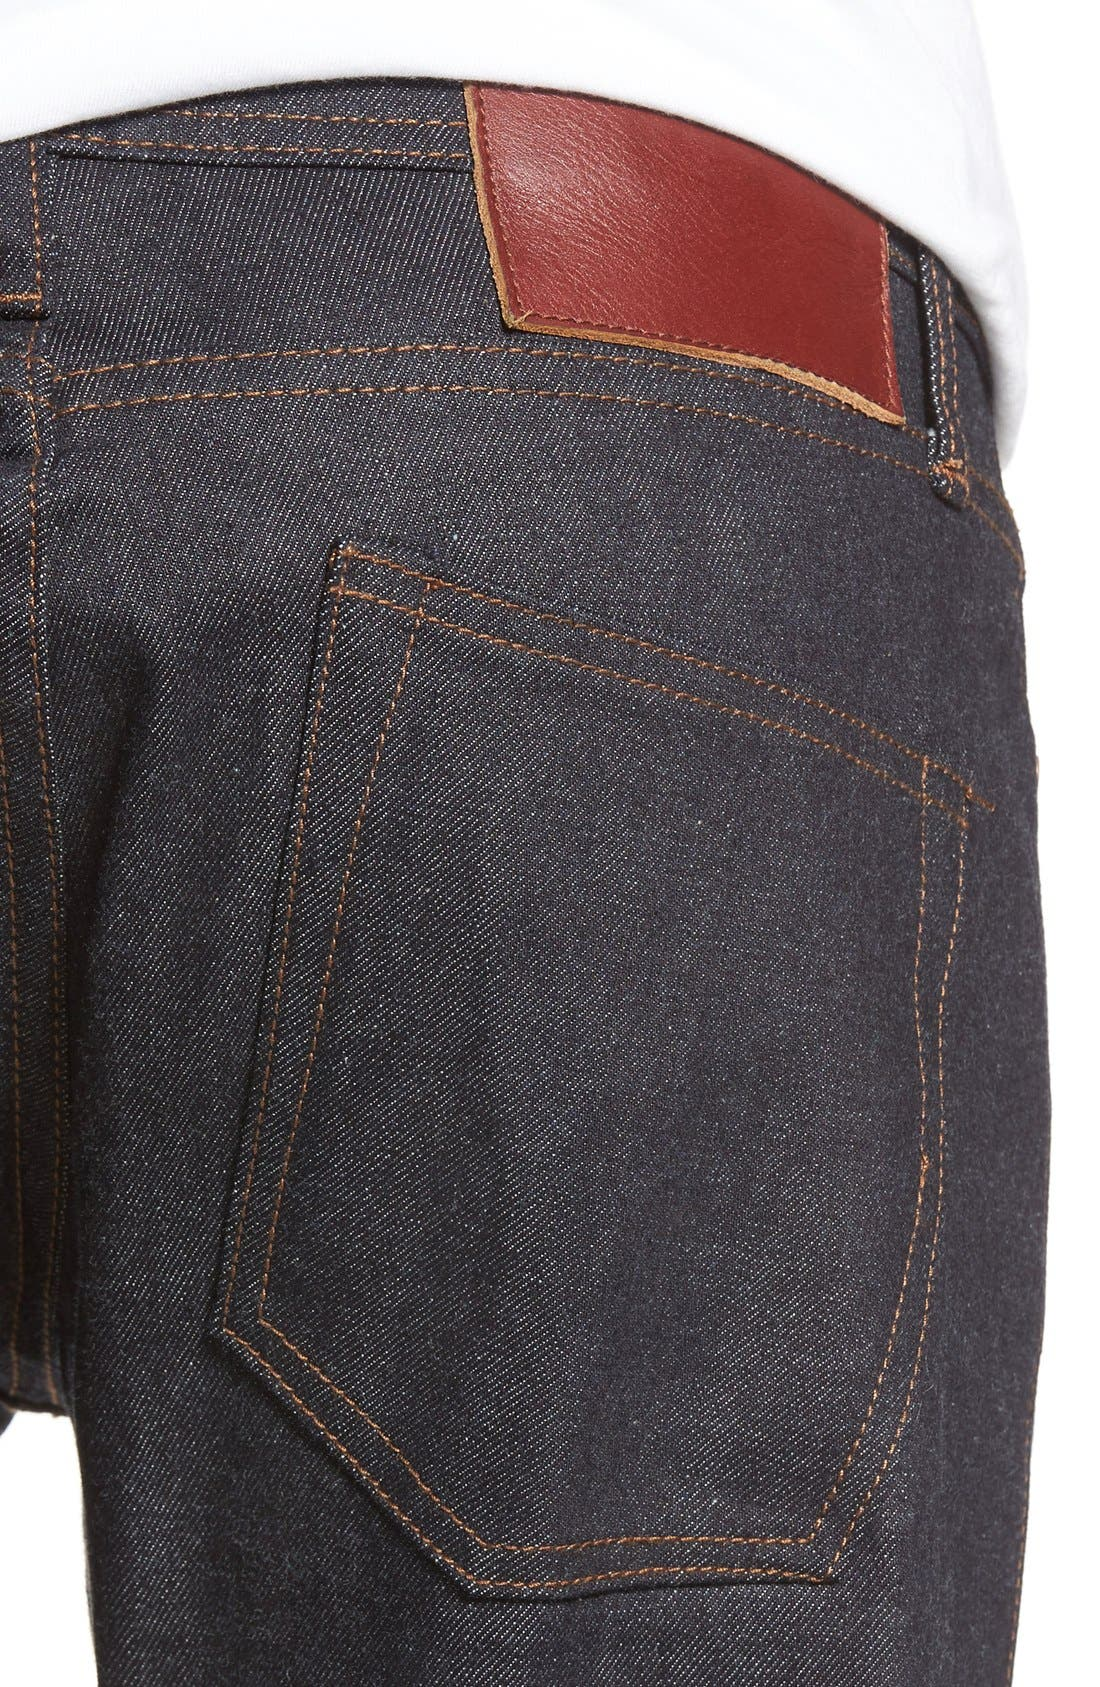 UB422 Selvedge Skinny Fit Jeans,                             Alternate thumbnail 4, color,                             401